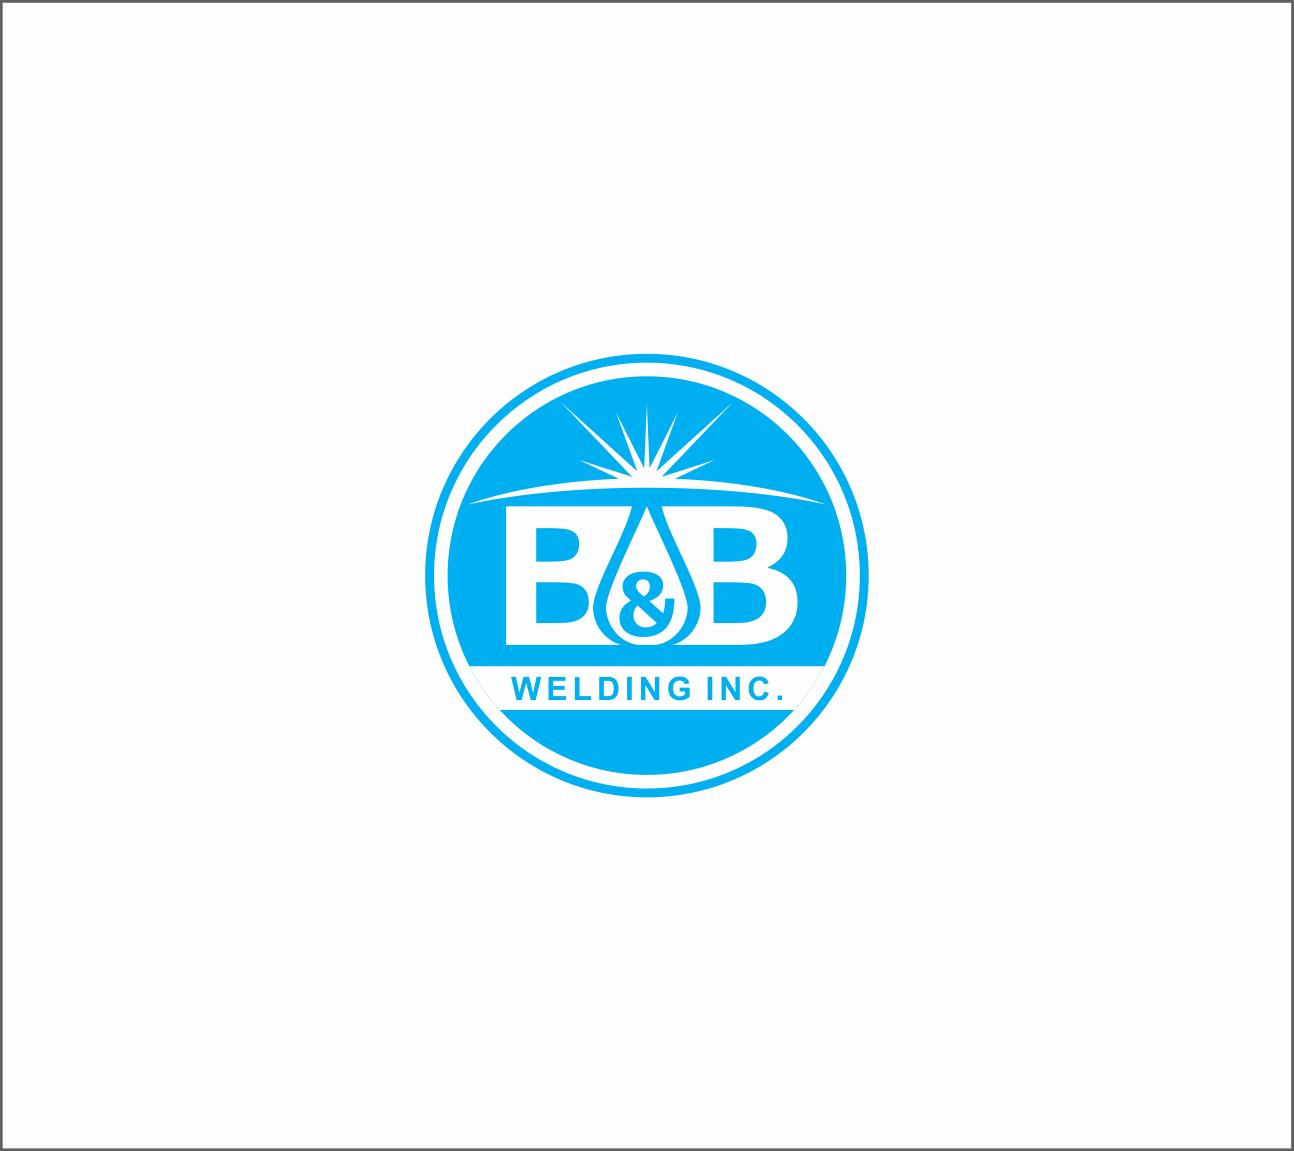 Logo Design by Armada Jamaluddin - Entry No. 32 in the Logo Design Contest Fun Logo Design for B&B Welding Inc..